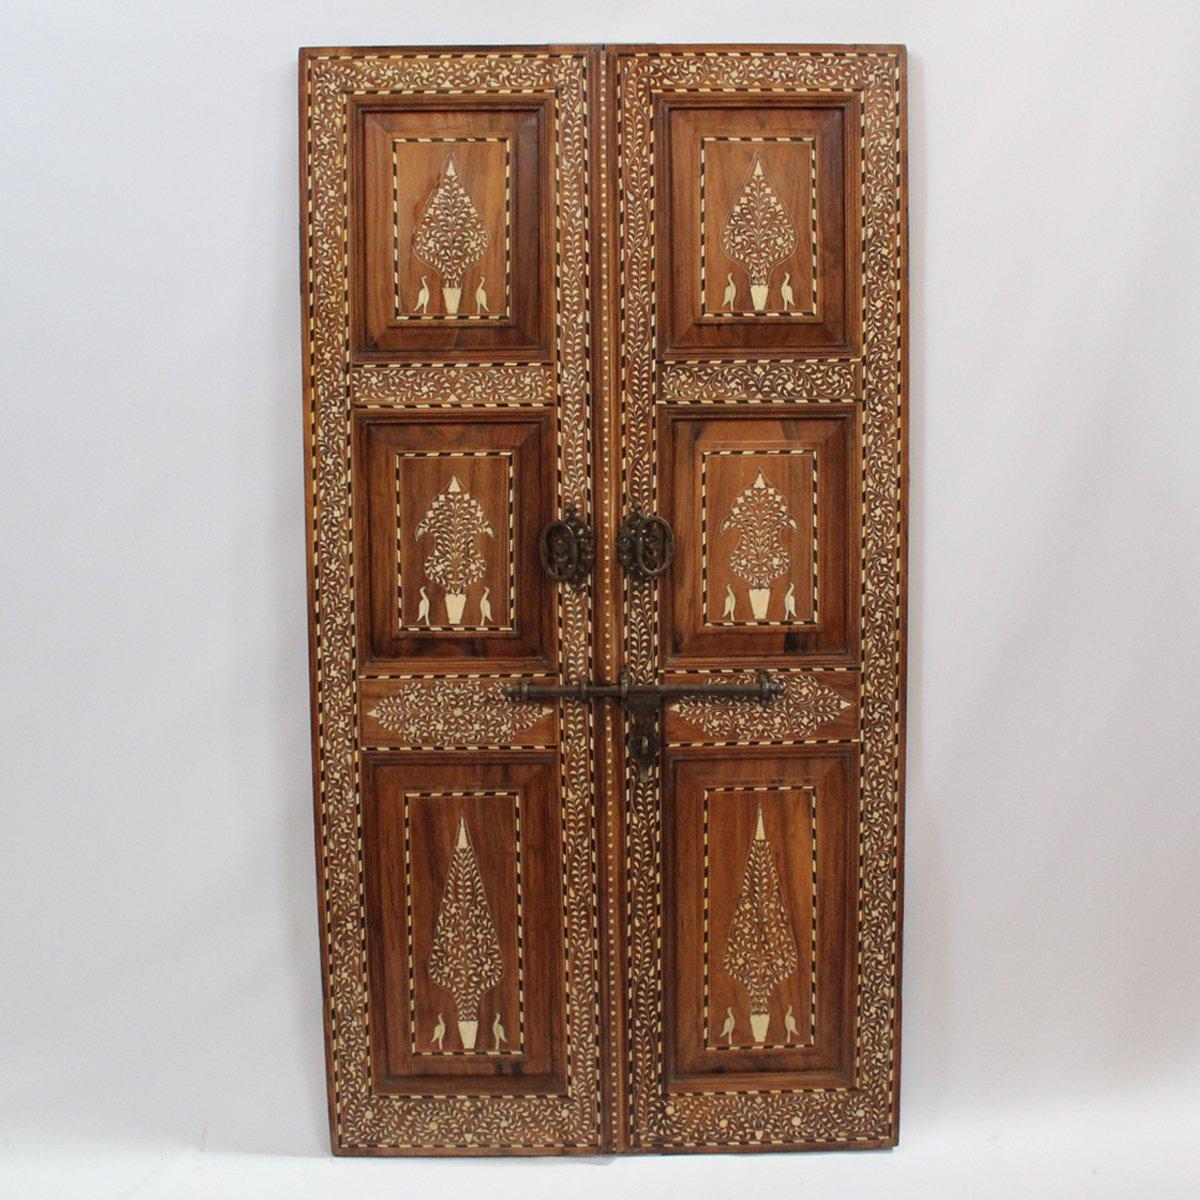 Inlay Doors